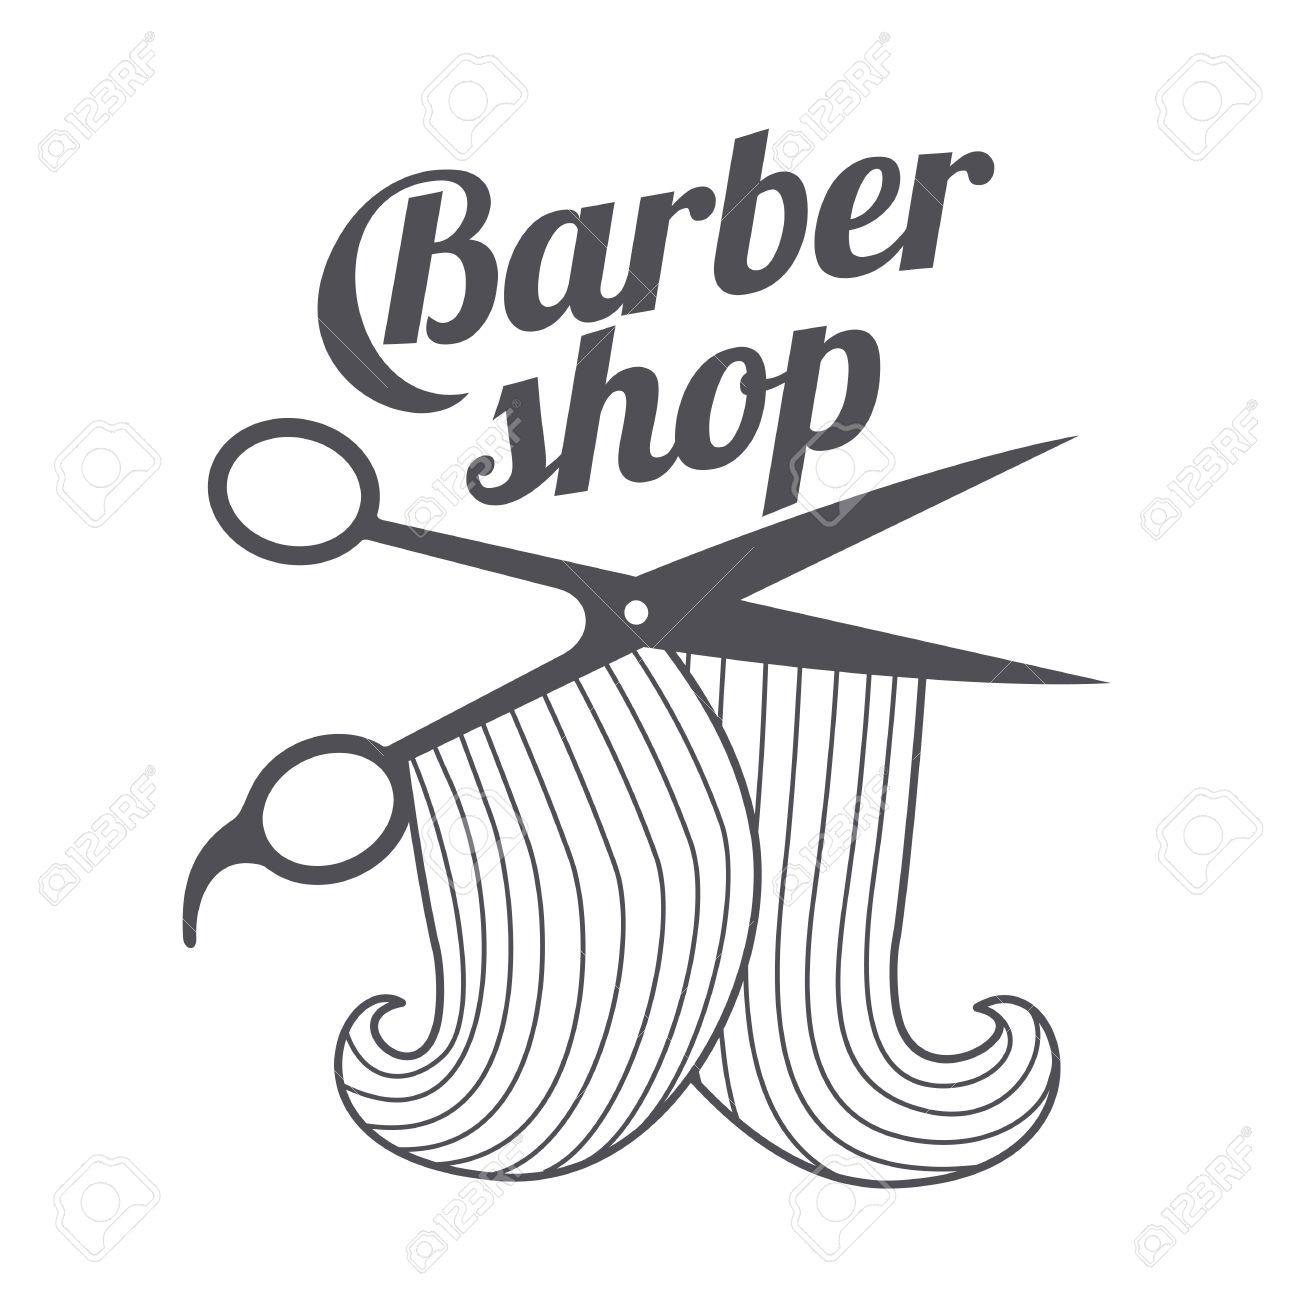 Barber shop logo templates. Hair, beard, razor, scissors, comb.